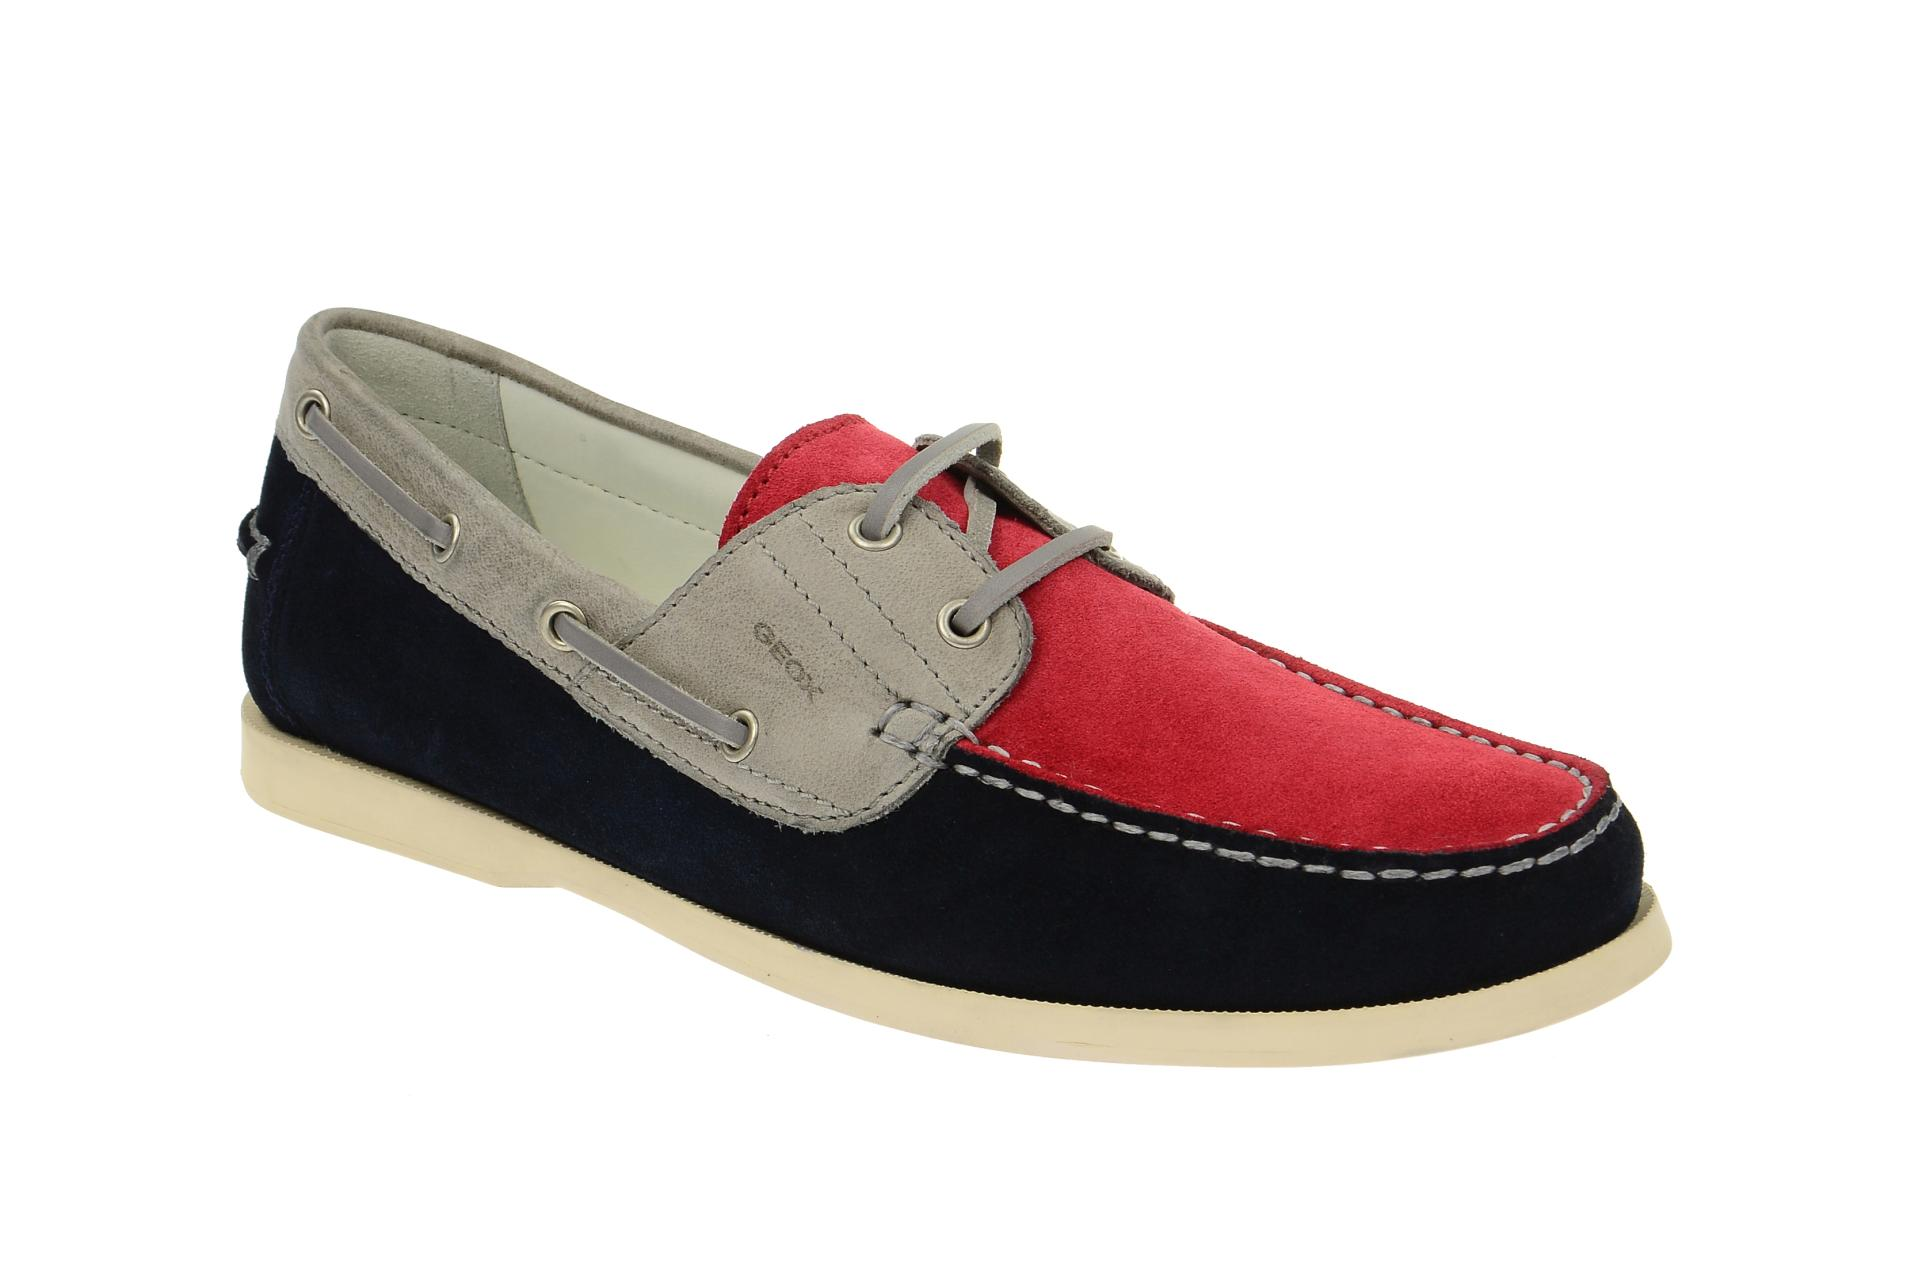 Geox Juarez Schuhe rot blau U52A8A :: Rot - 40 - Männlich - Erwachsene